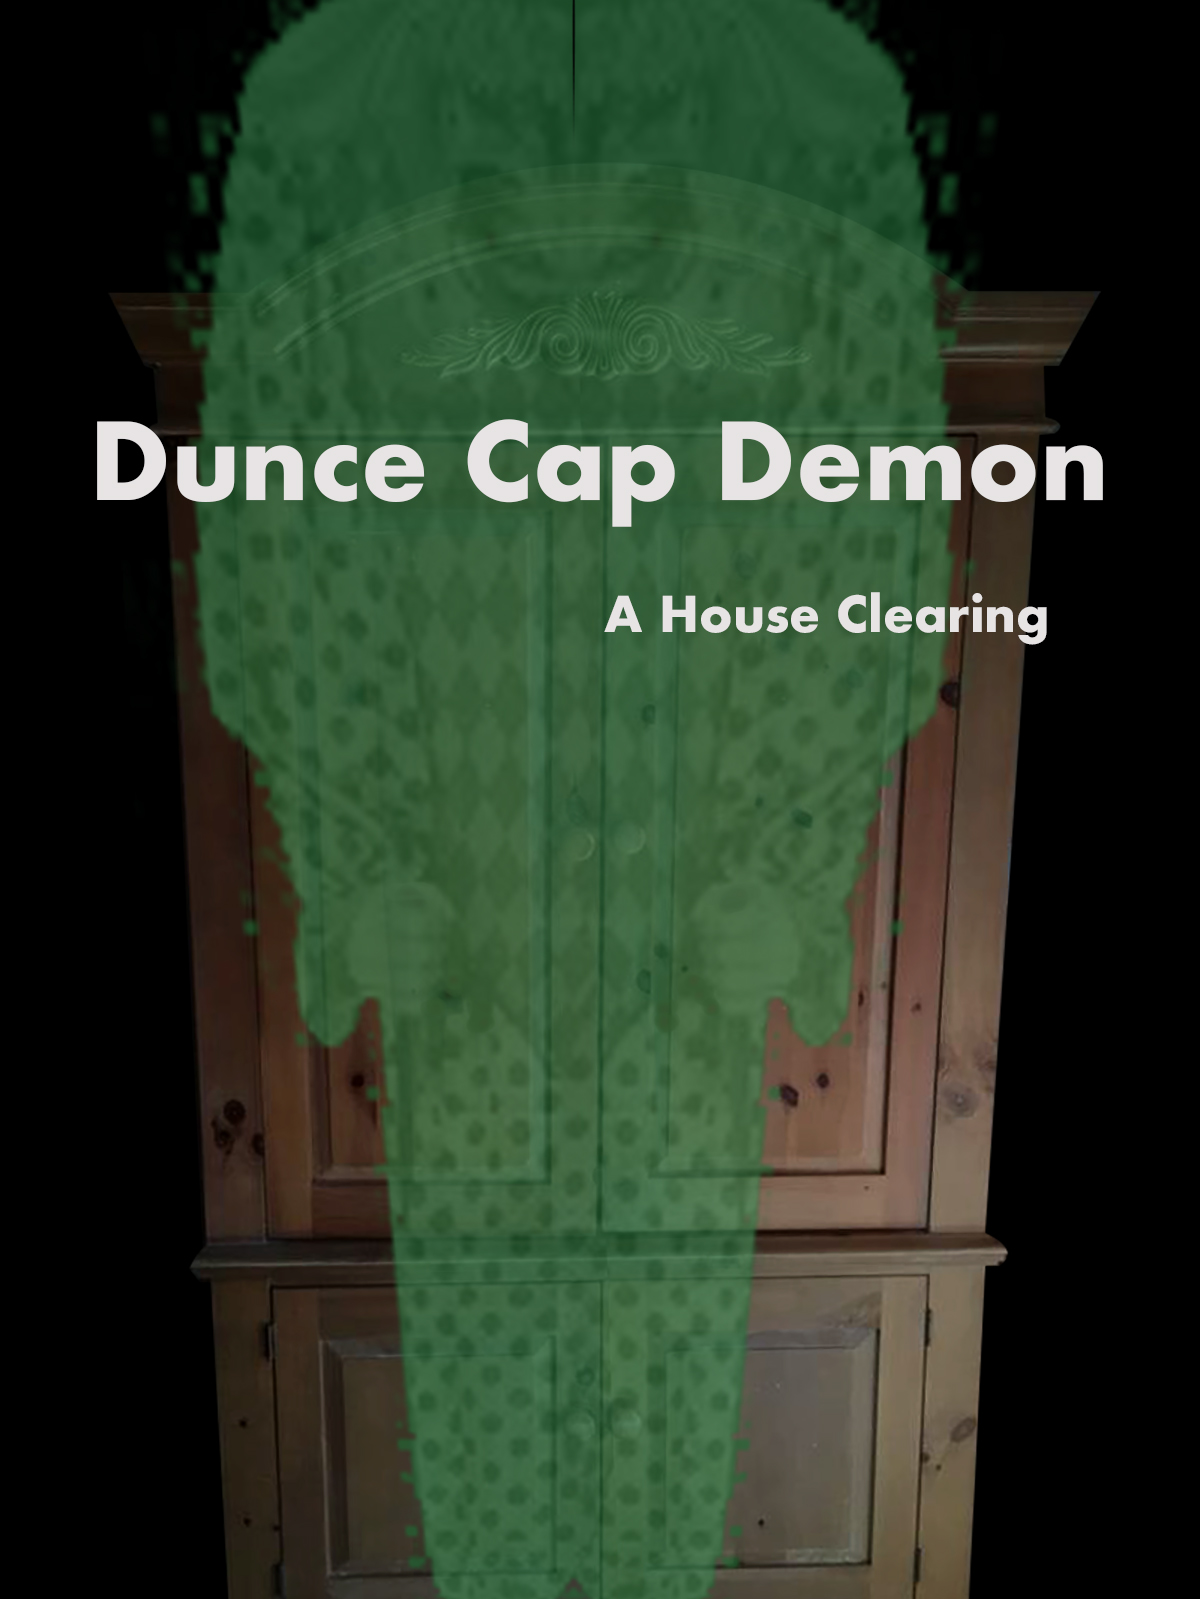 Dunce Cap Demon Pic.jpg